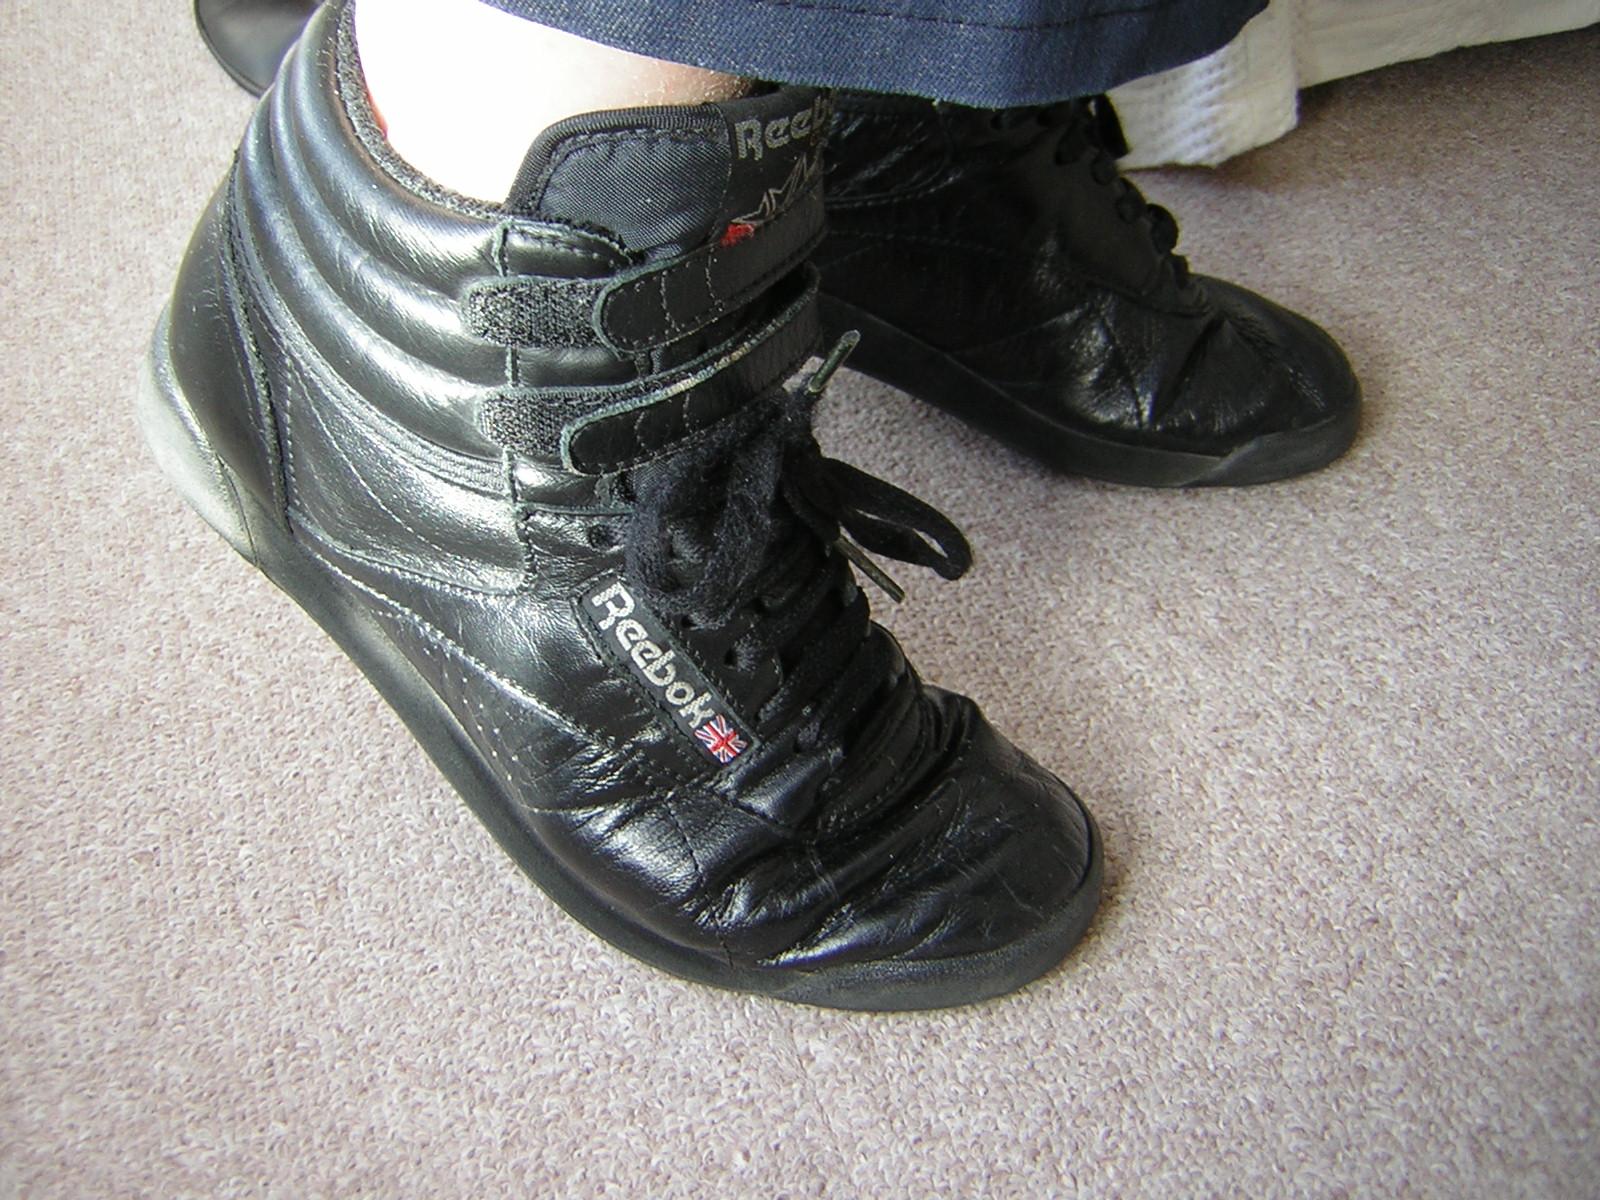 Reebok High Top Basketball Shoes